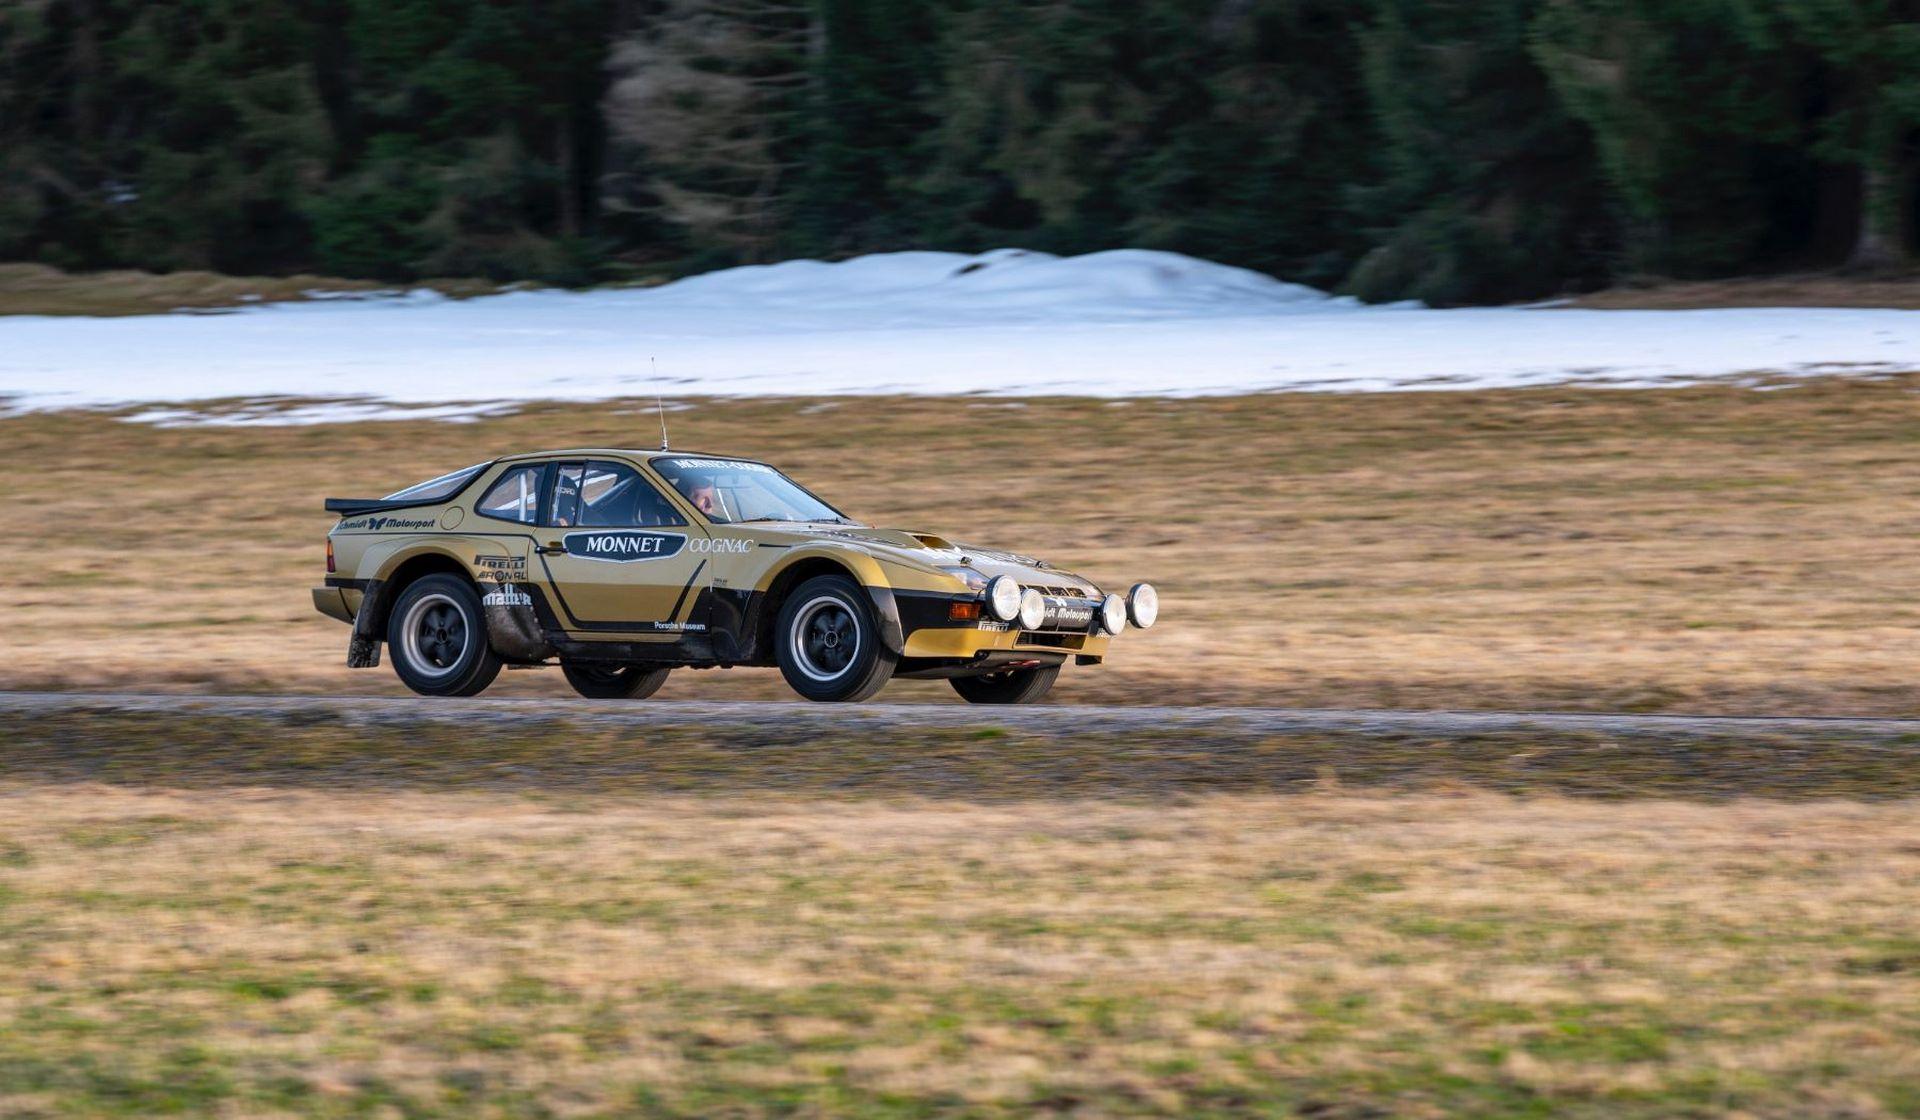 Porsche-924-Carrera-GTS-rally-car-Walter-Rohrl-2